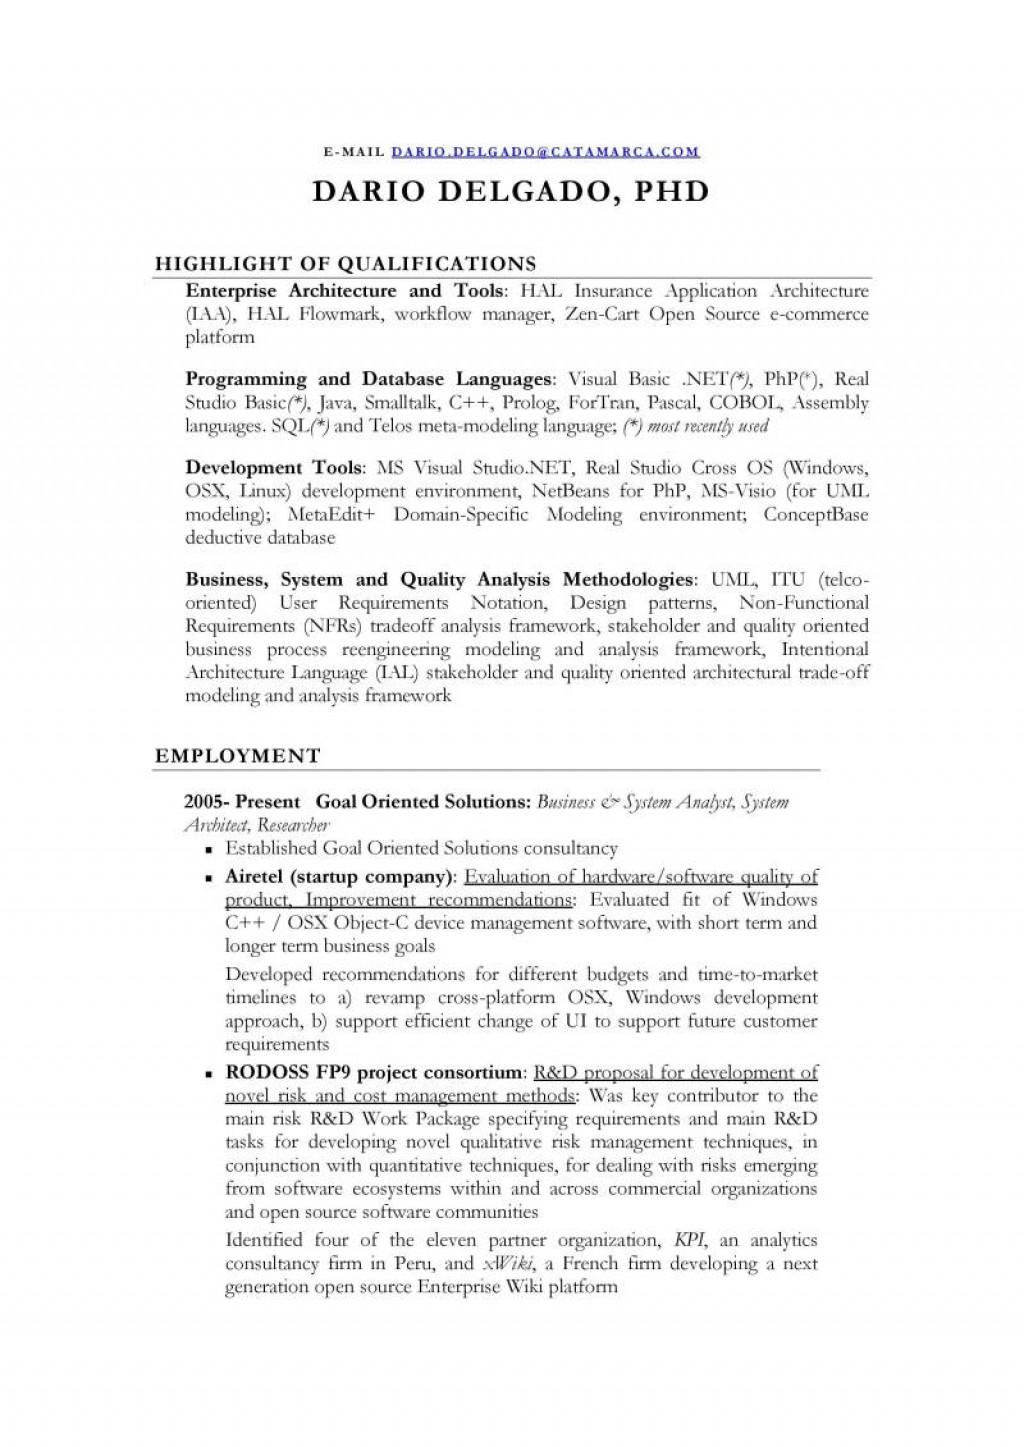 016 Sample Resume Net Developer Unique Essays Apply Texas Professional School Essay Example Of Developerresize8002c1131ssl1 Topic Frightening C Examples Large